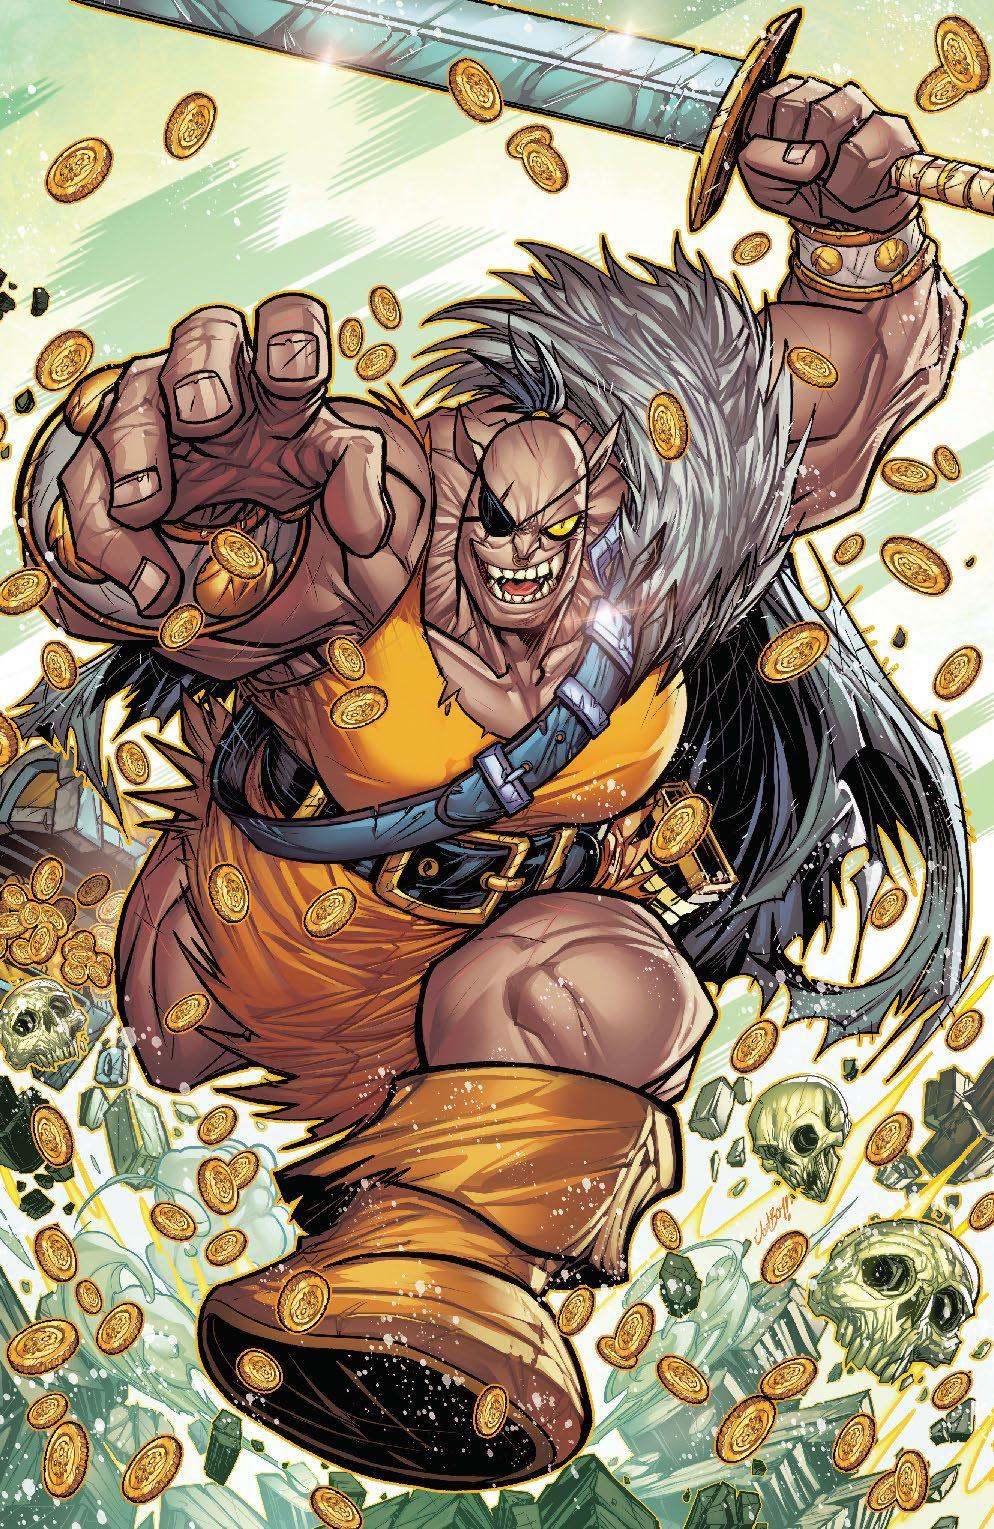 Orcs_003_Cover_C_Variant ComicList Previews: ORCS #3 (OF 5)